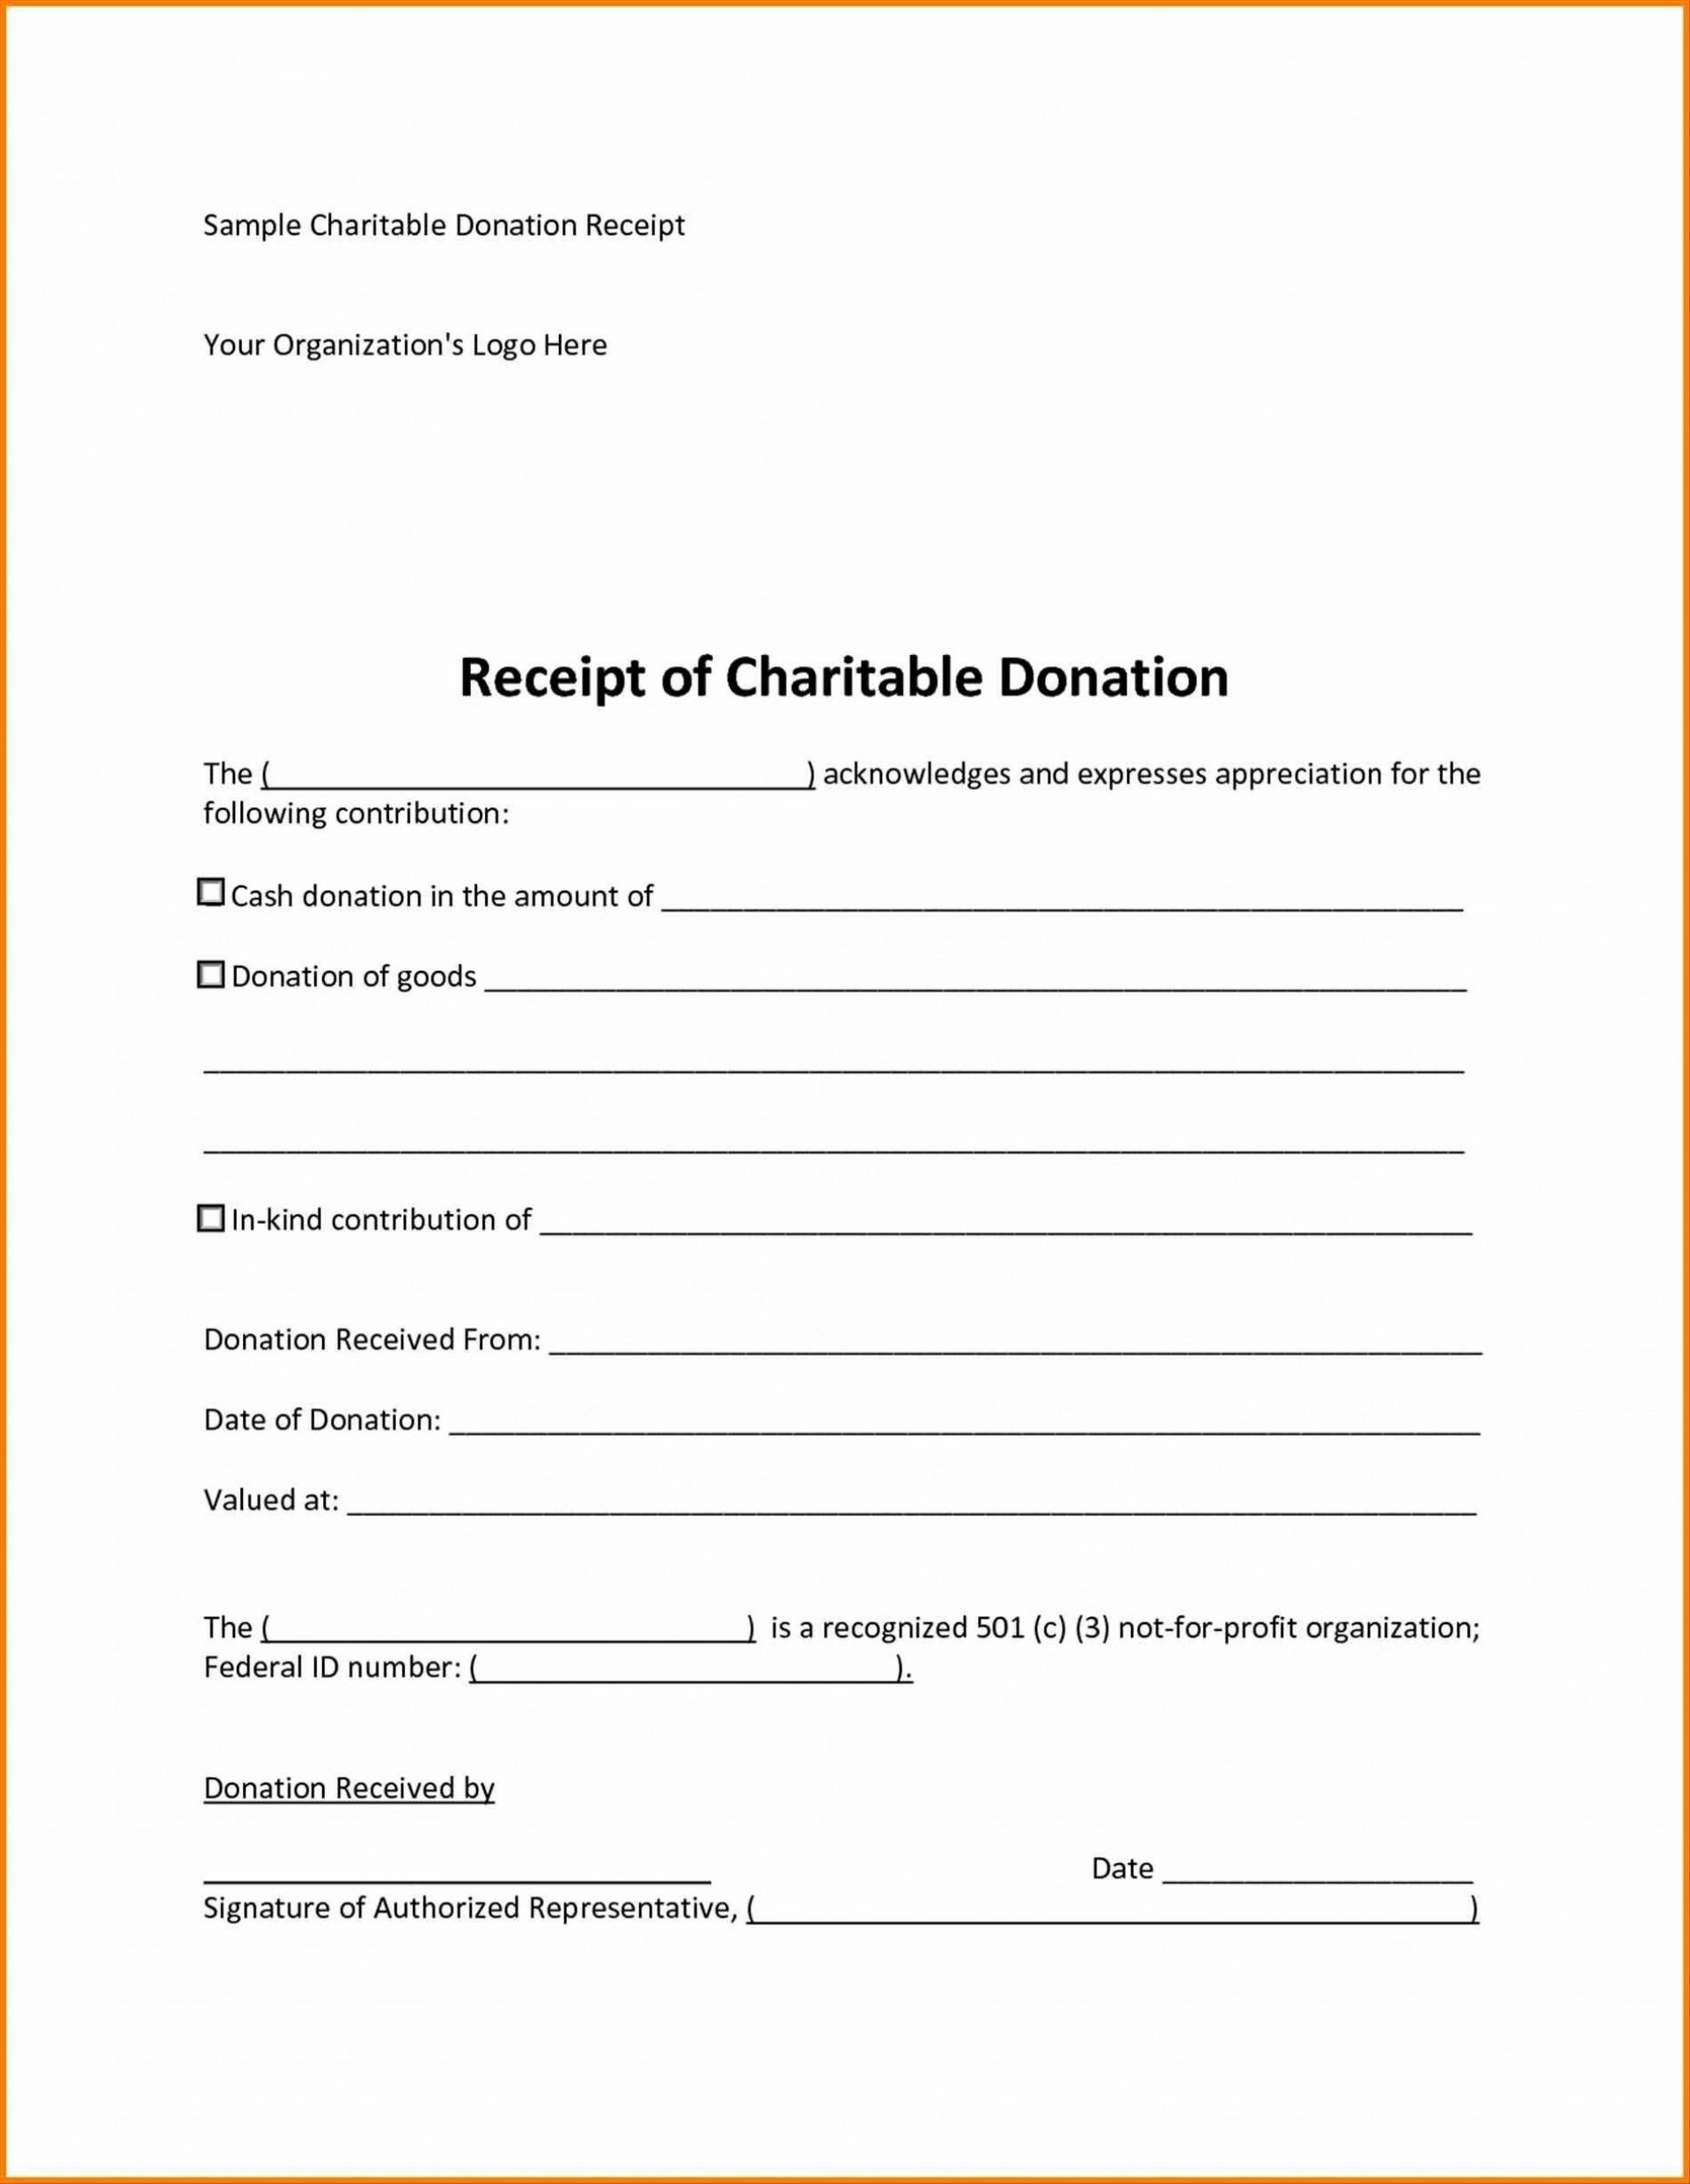 008 Phenomenal Charitable Tax Receipt Template Inspiration  Donation1920